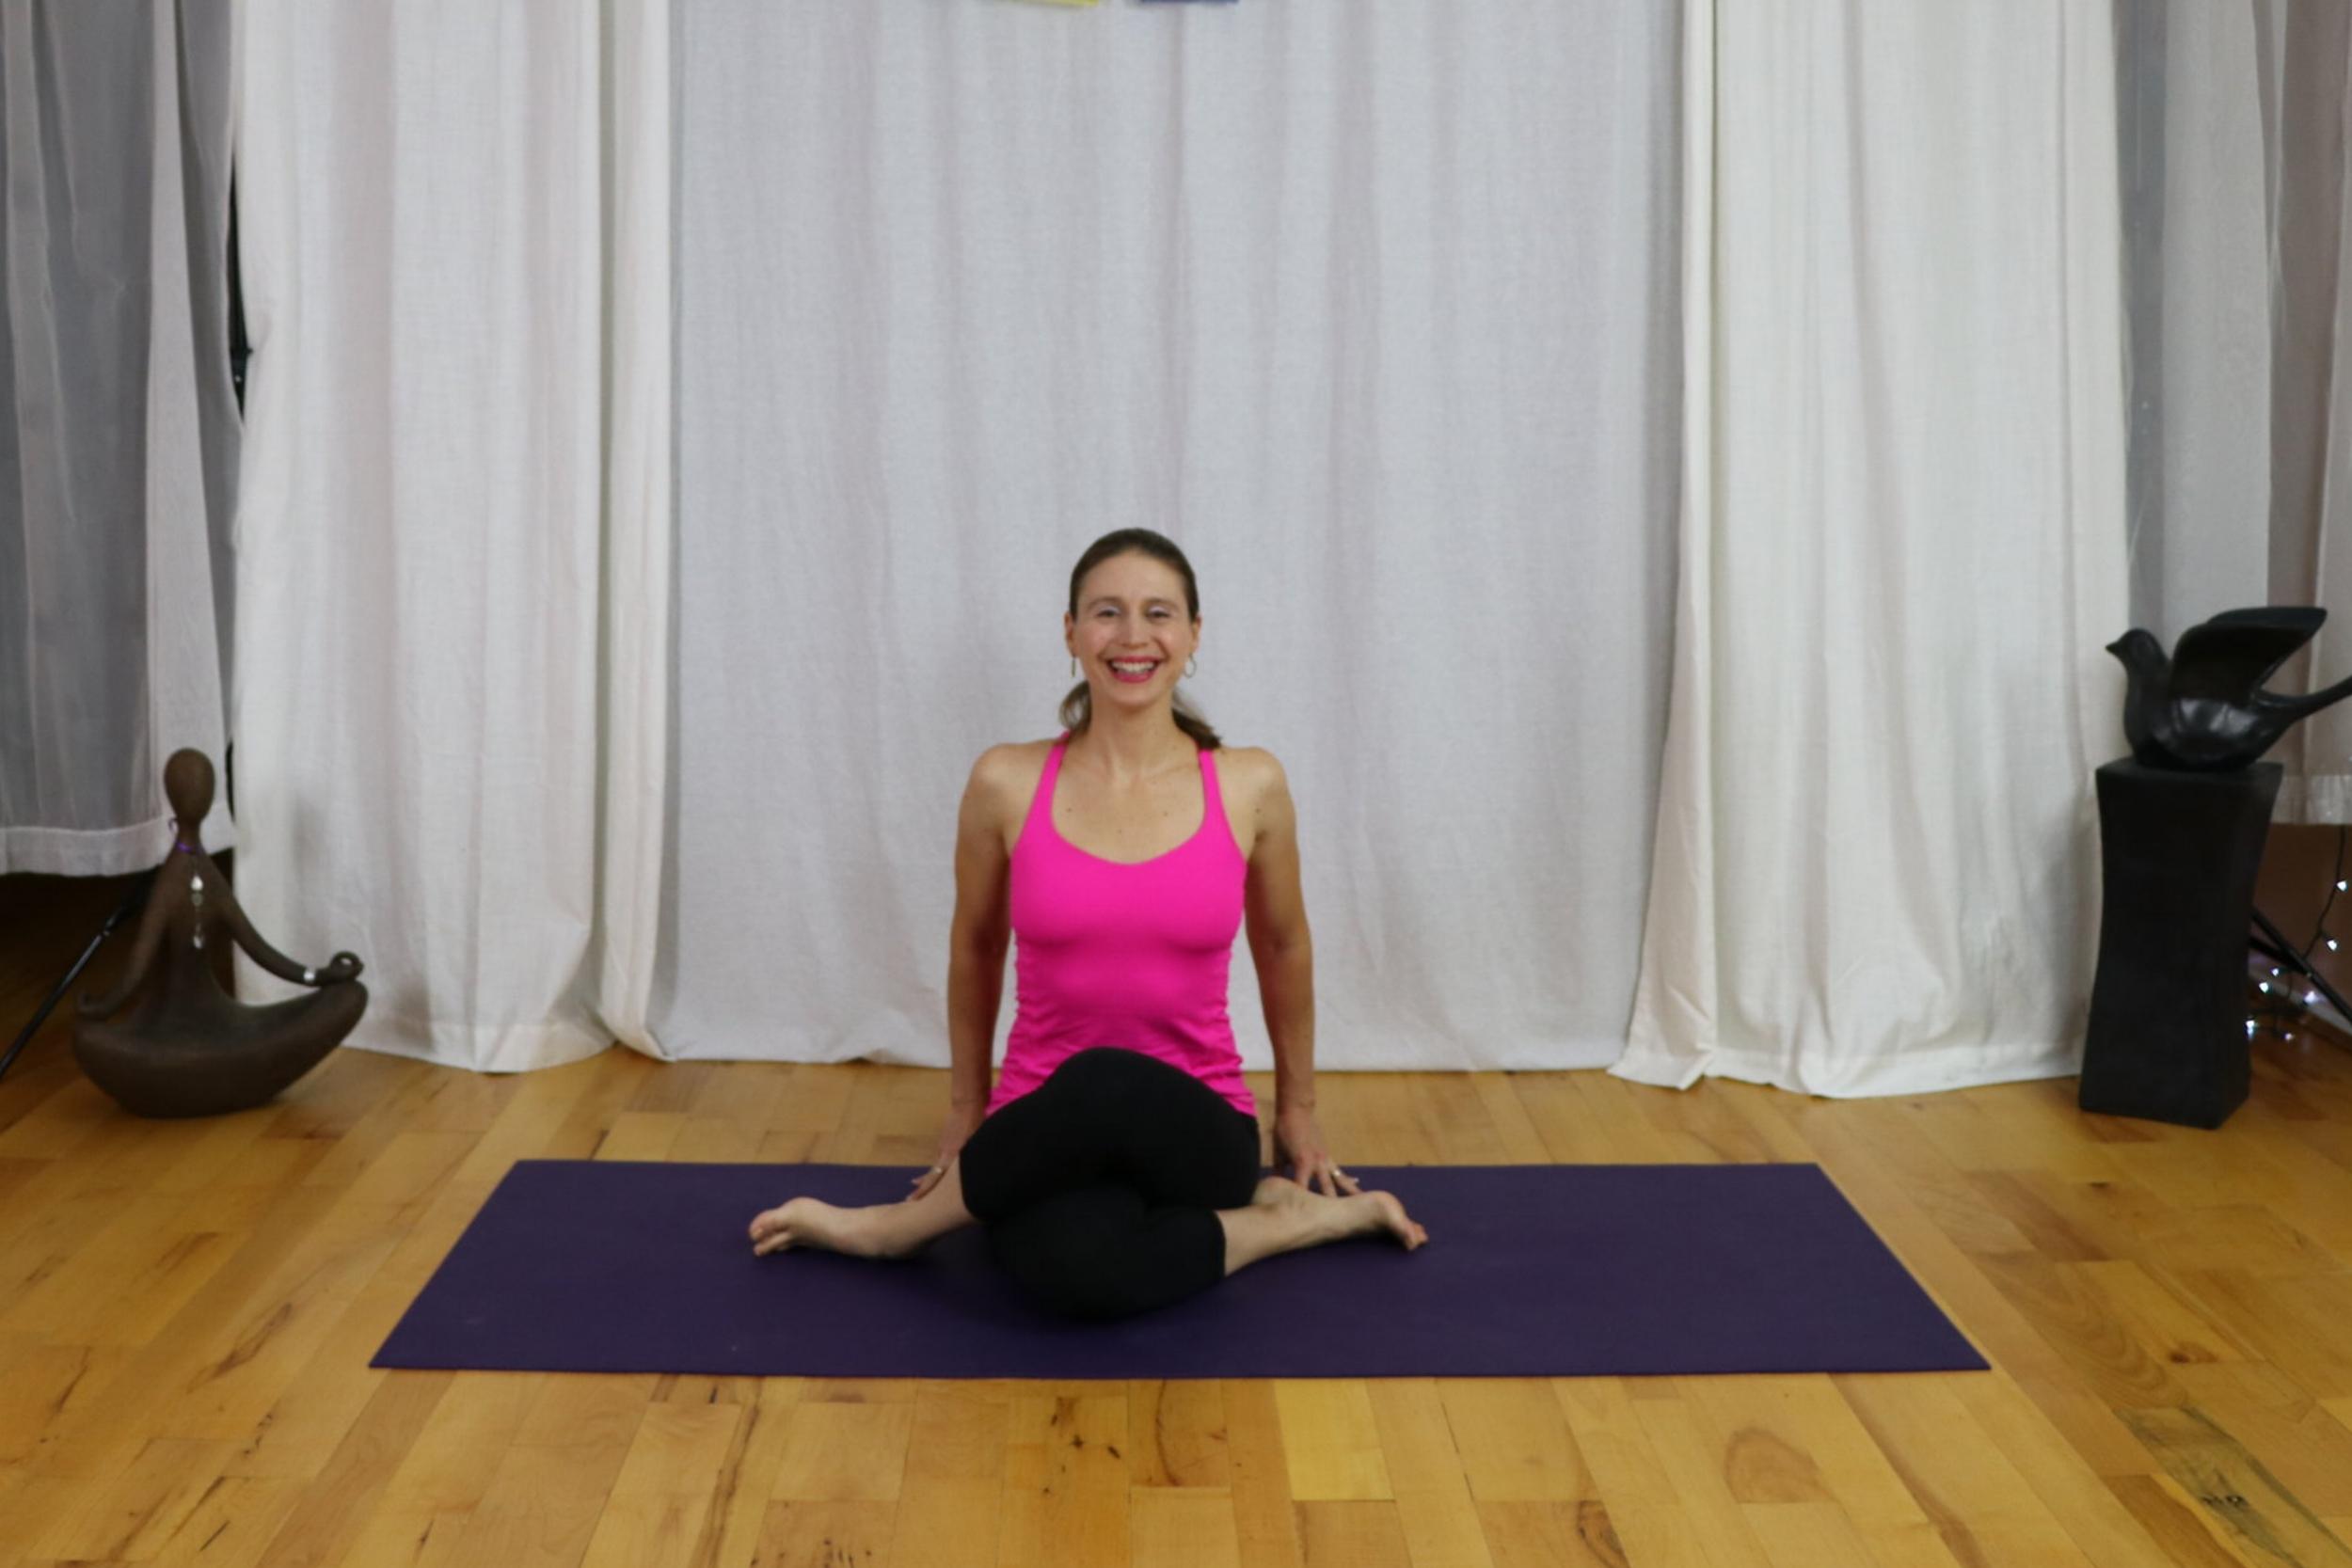 yoga for stiff hips with irena miller. cow face pose/gomukhasana www.irenamiller.com